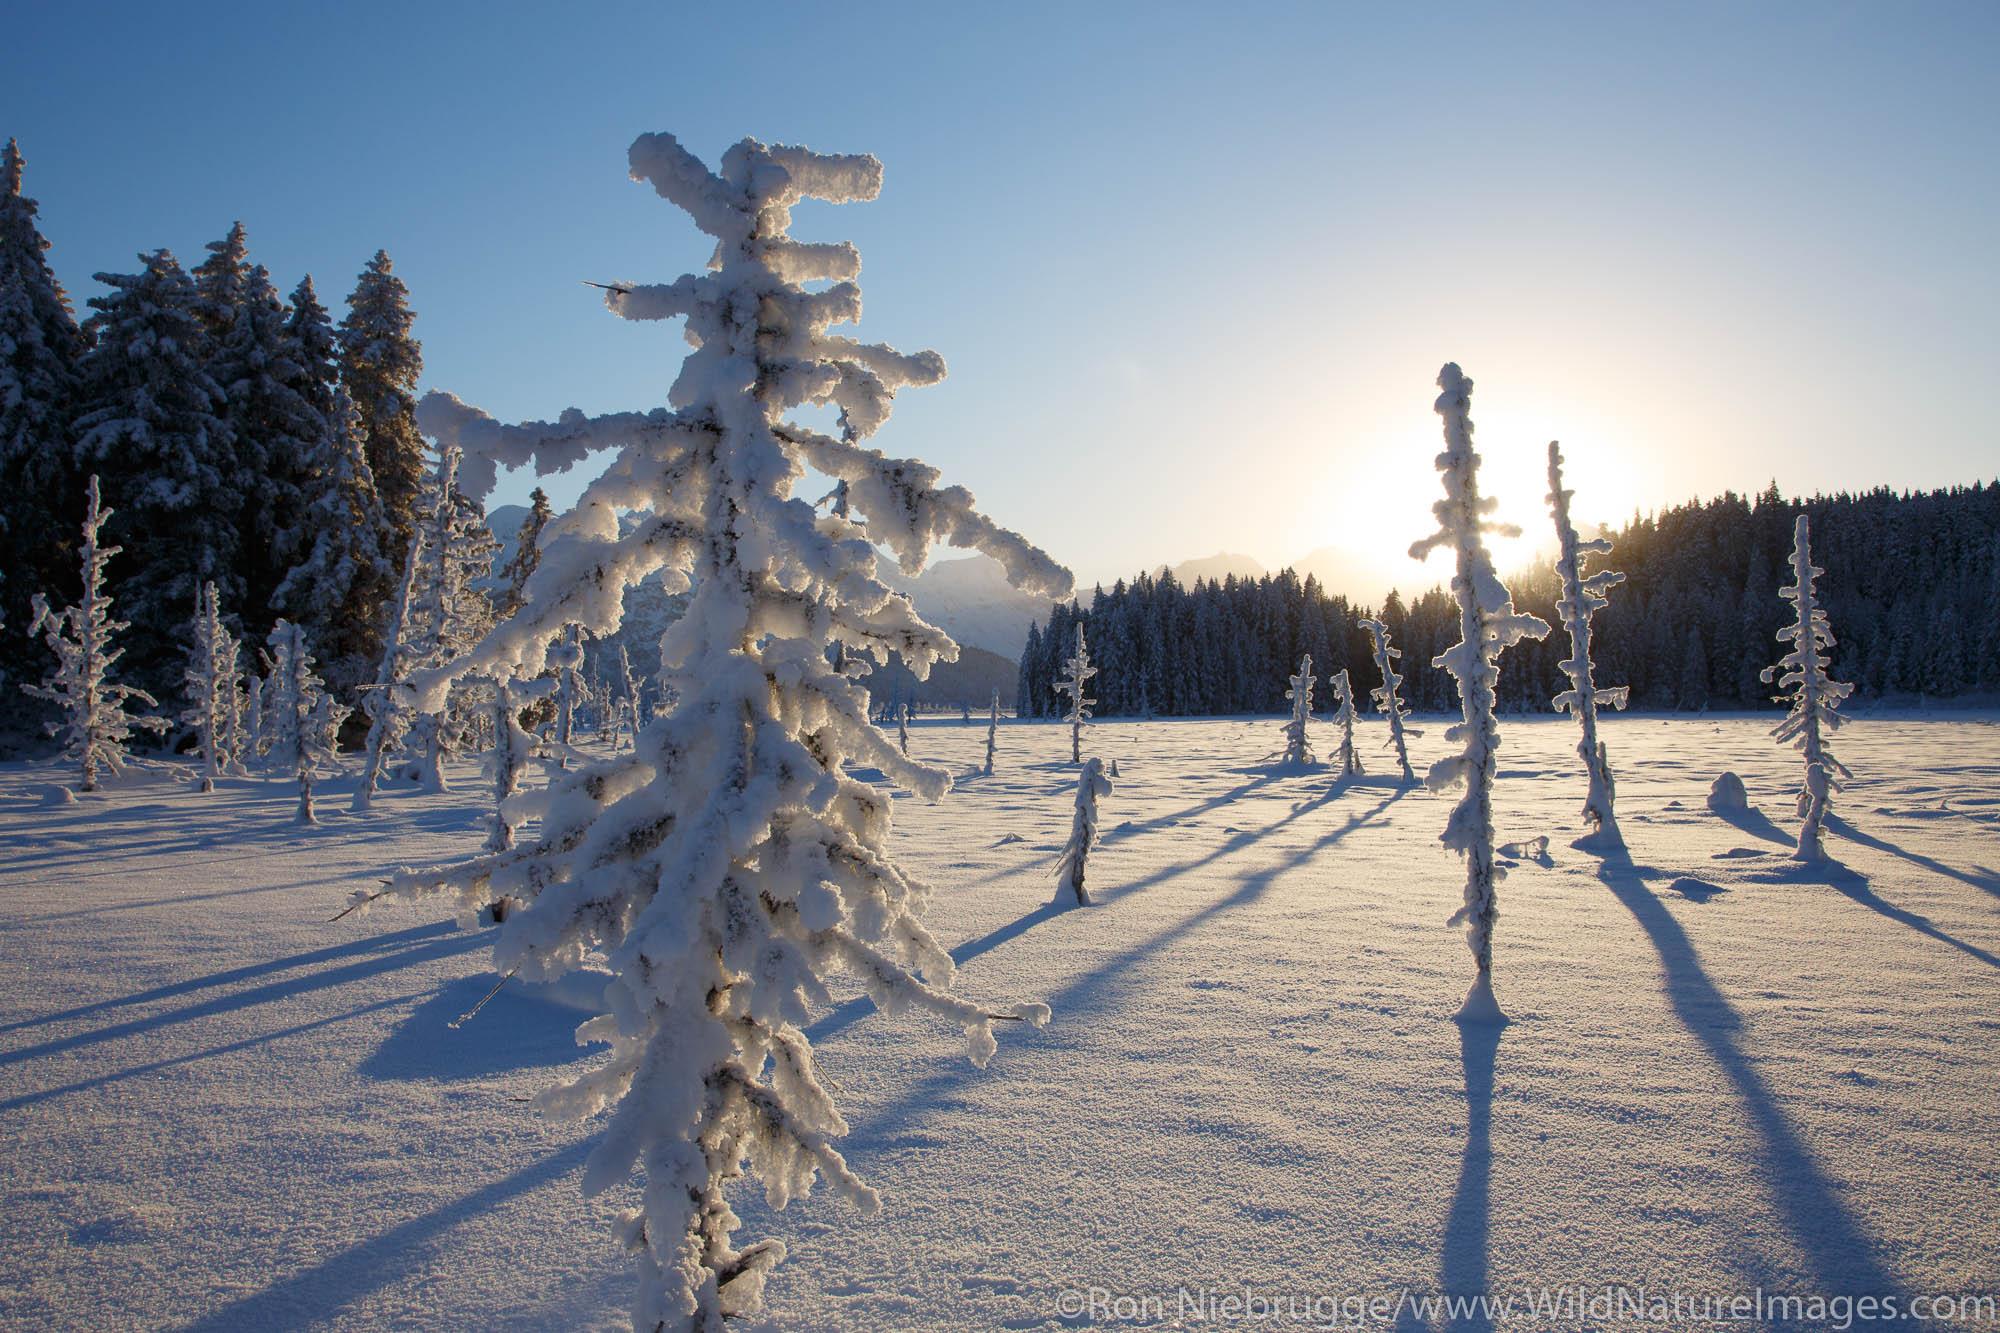 Winter in the Chugach National Forest, Alaska.